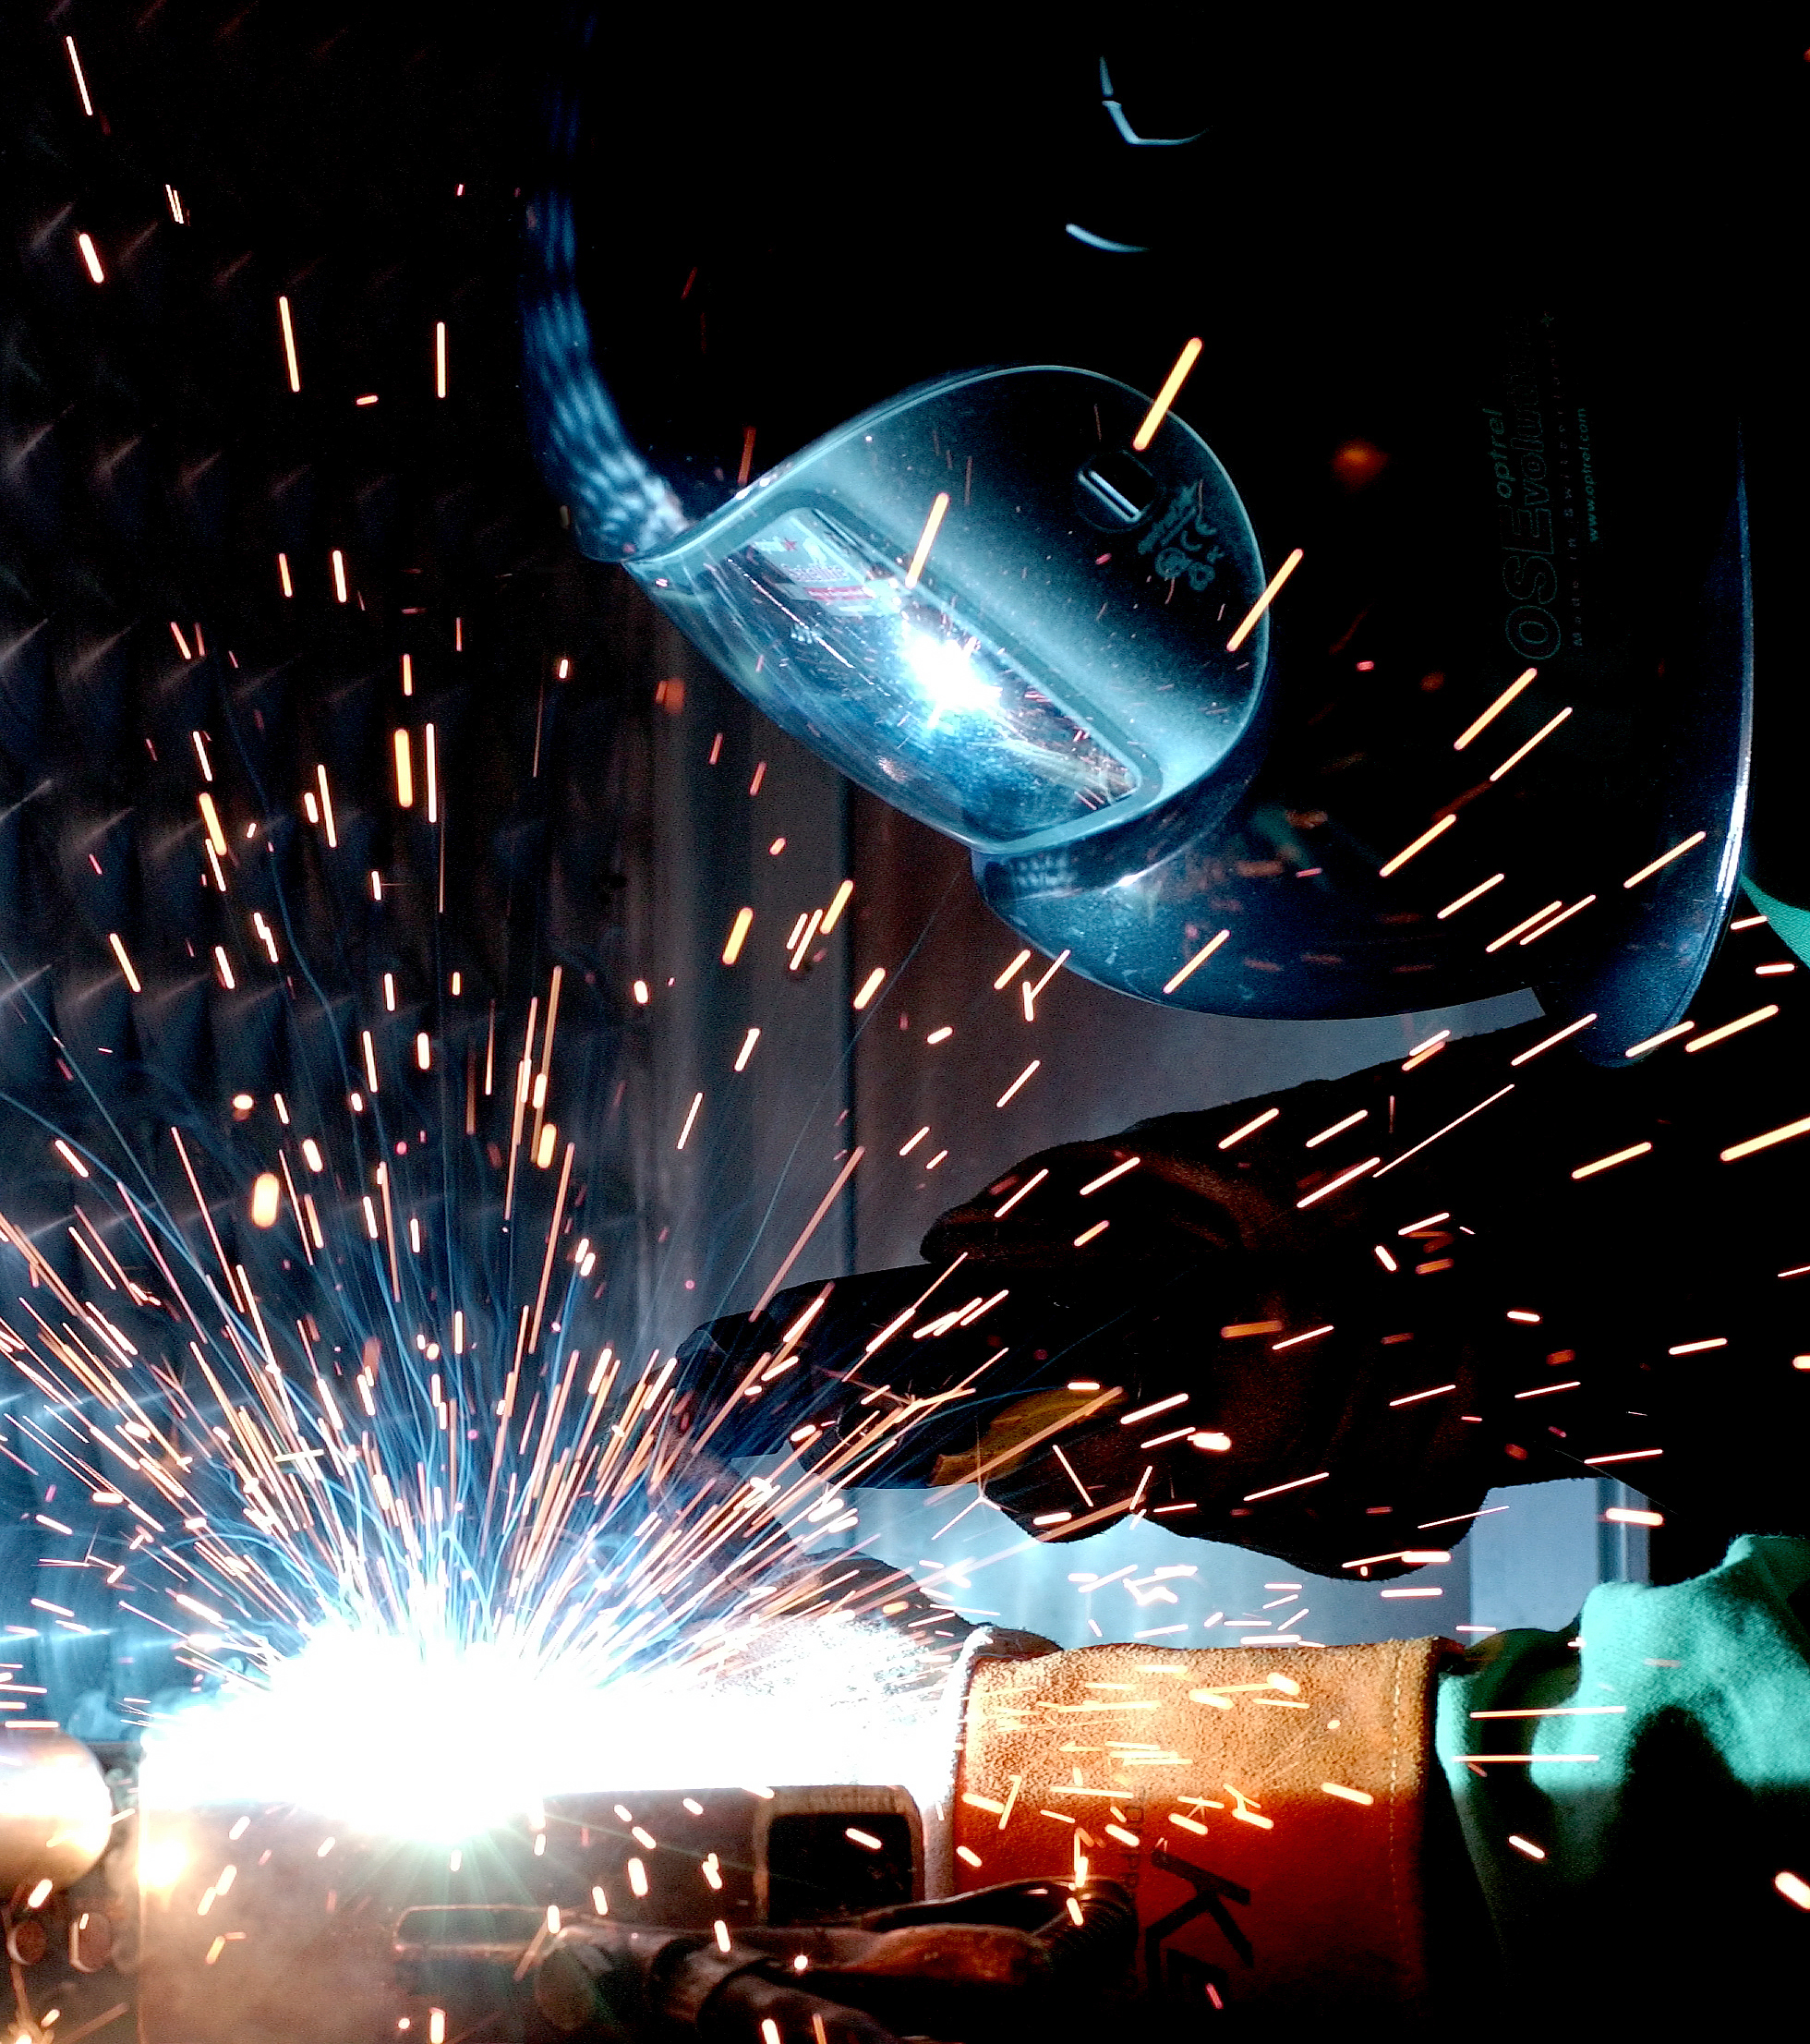 The Healthy Maker: Tackling Vapors, Fumes And Heavy Metals